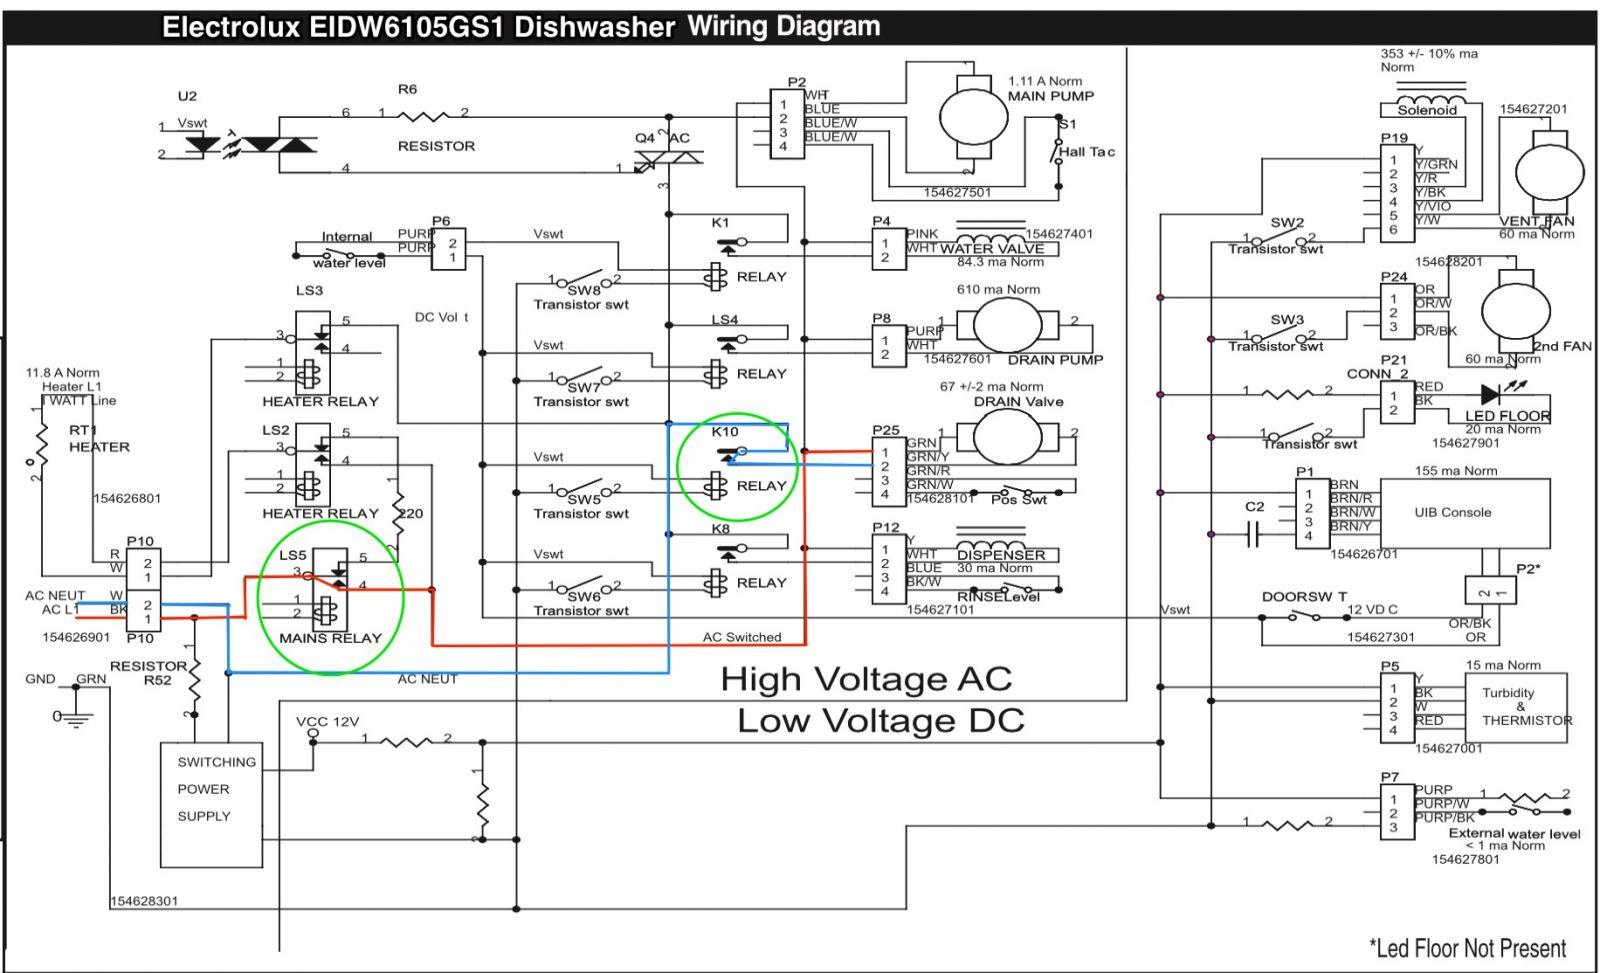 electrolux wiring diagram 5 way trailer plug gmc eidw6105gs1 dishwasher the appliantology image tools